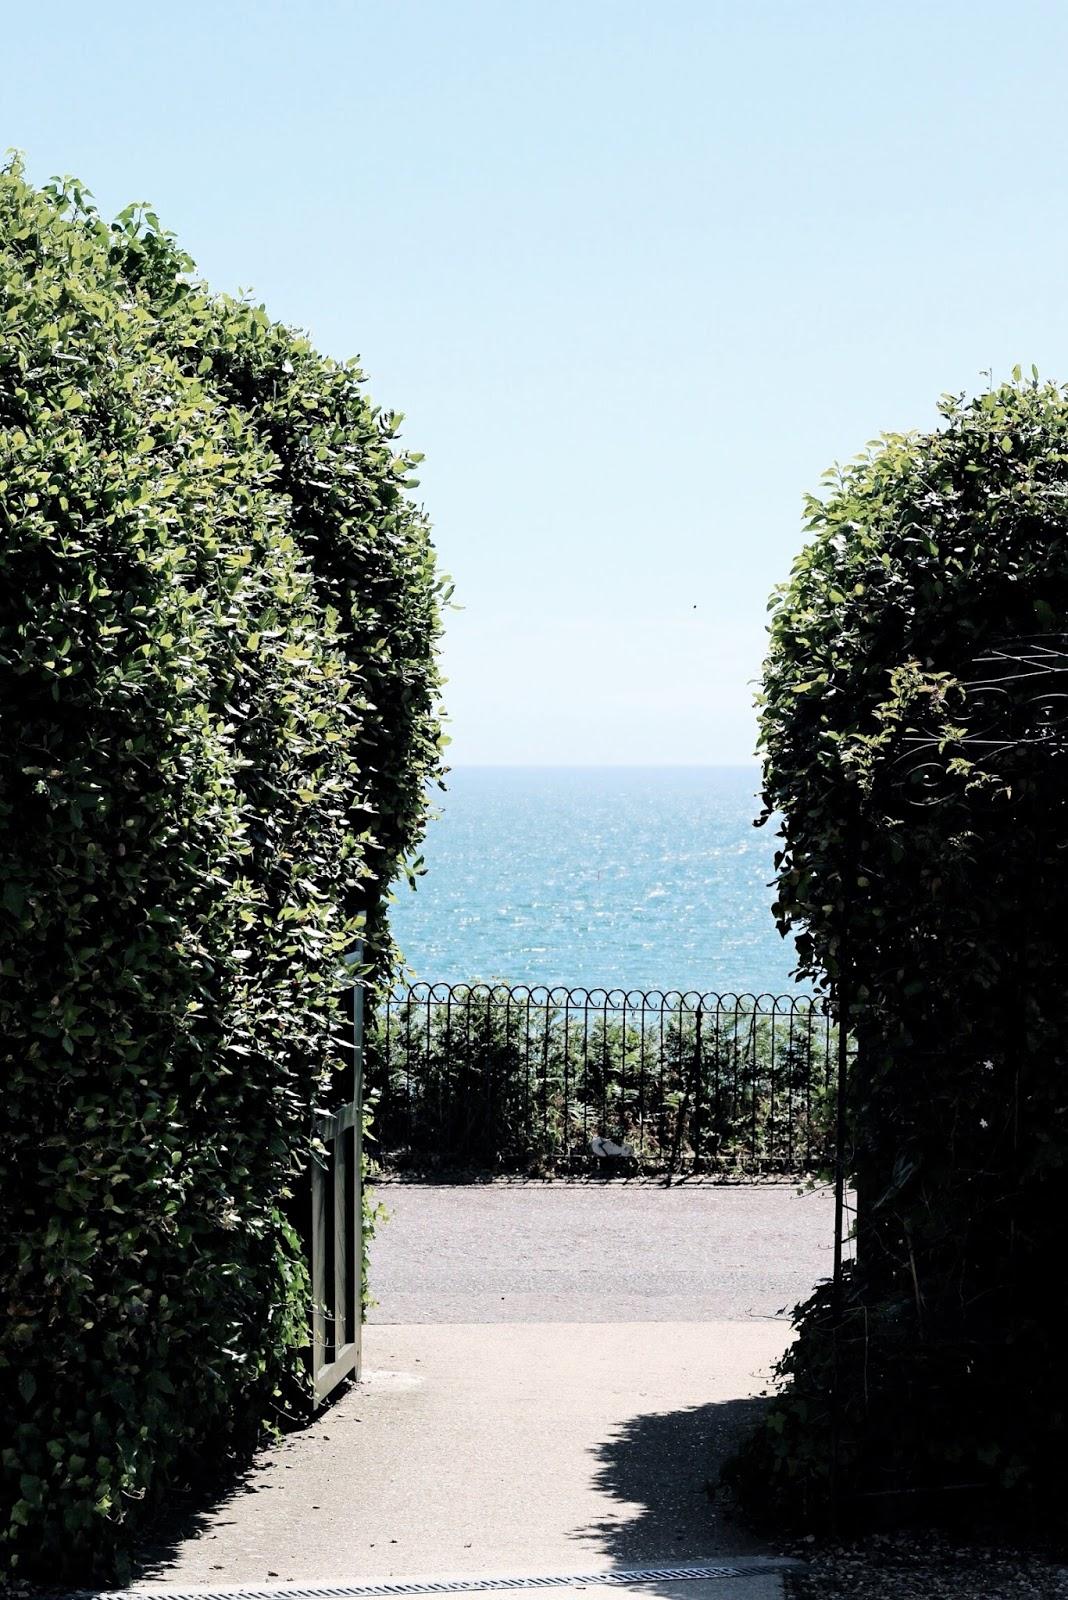 Summer seaside Bournemouth views